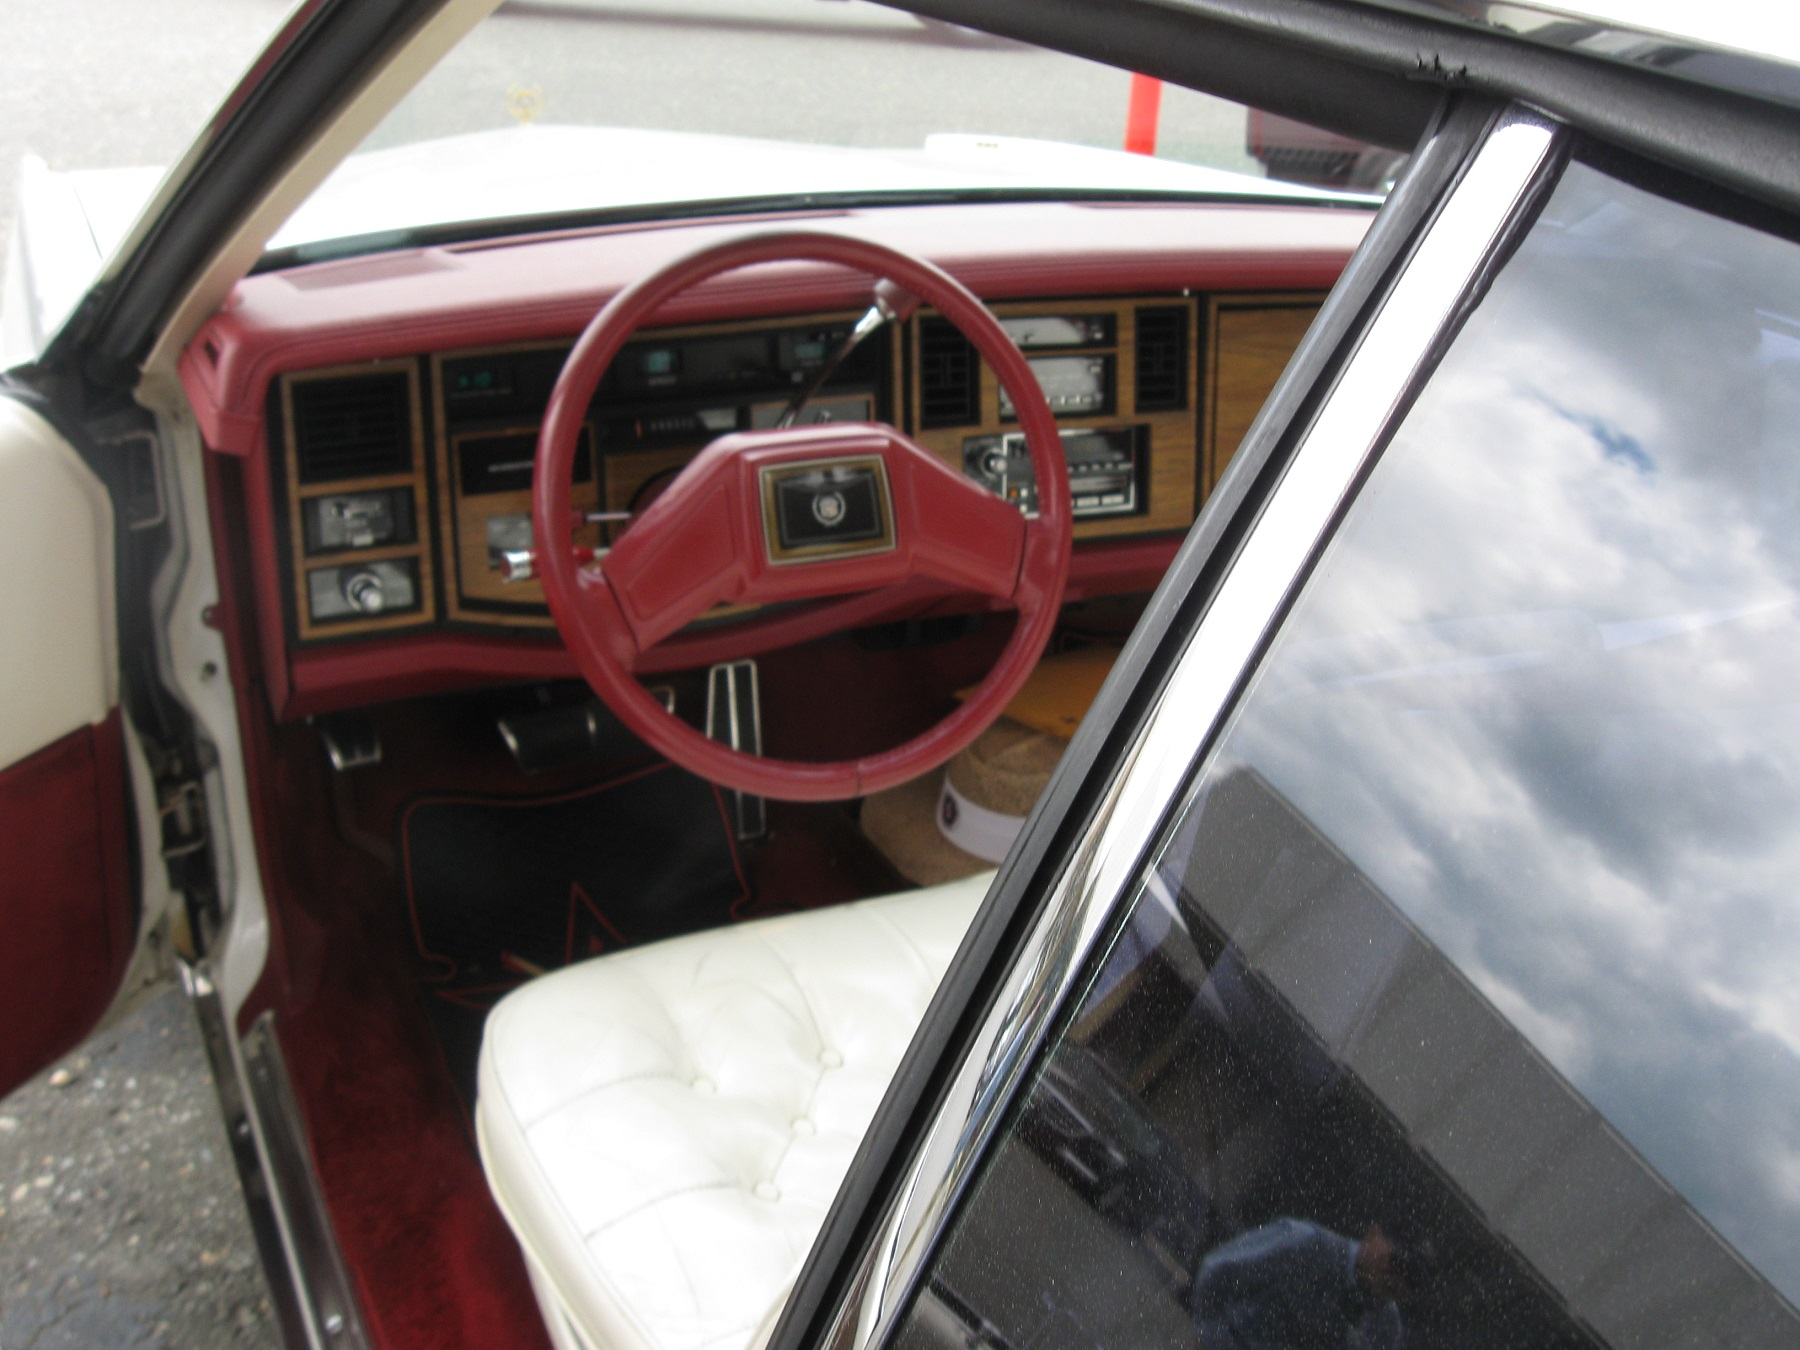 Big 1985 Cadillac V-8 with Low 135-Horsepower - Classic Classics ...